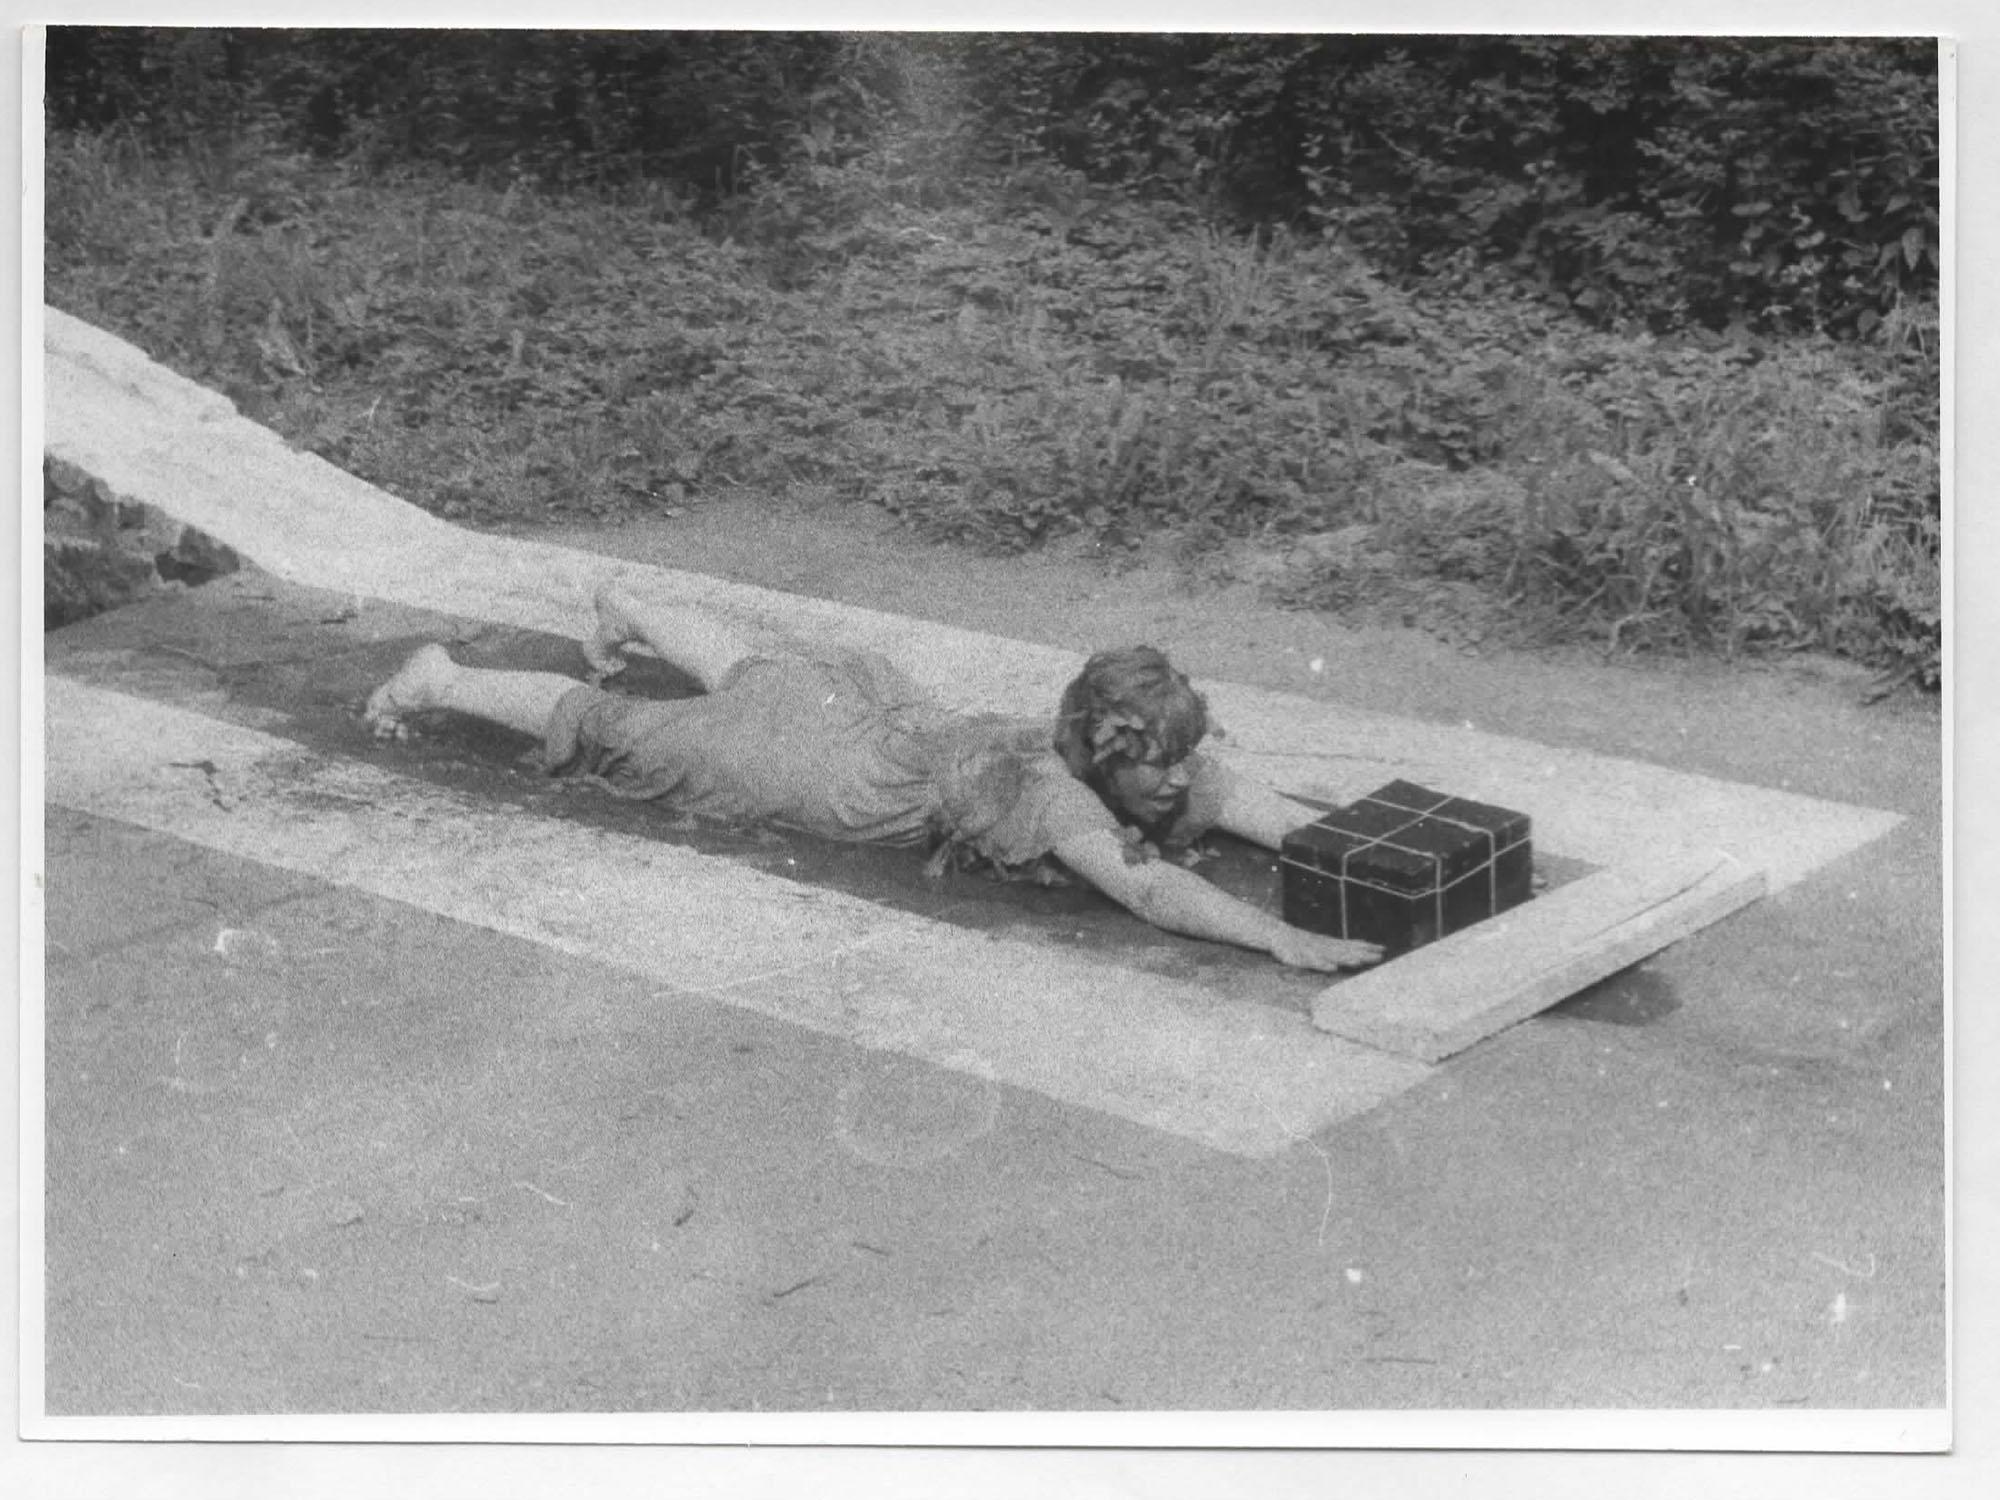 Shirley Cameron and Roland Miller, Inspection Pit, (1978). 45 minutes, Plener Miastko, International Symposium, Warcino, Poland.